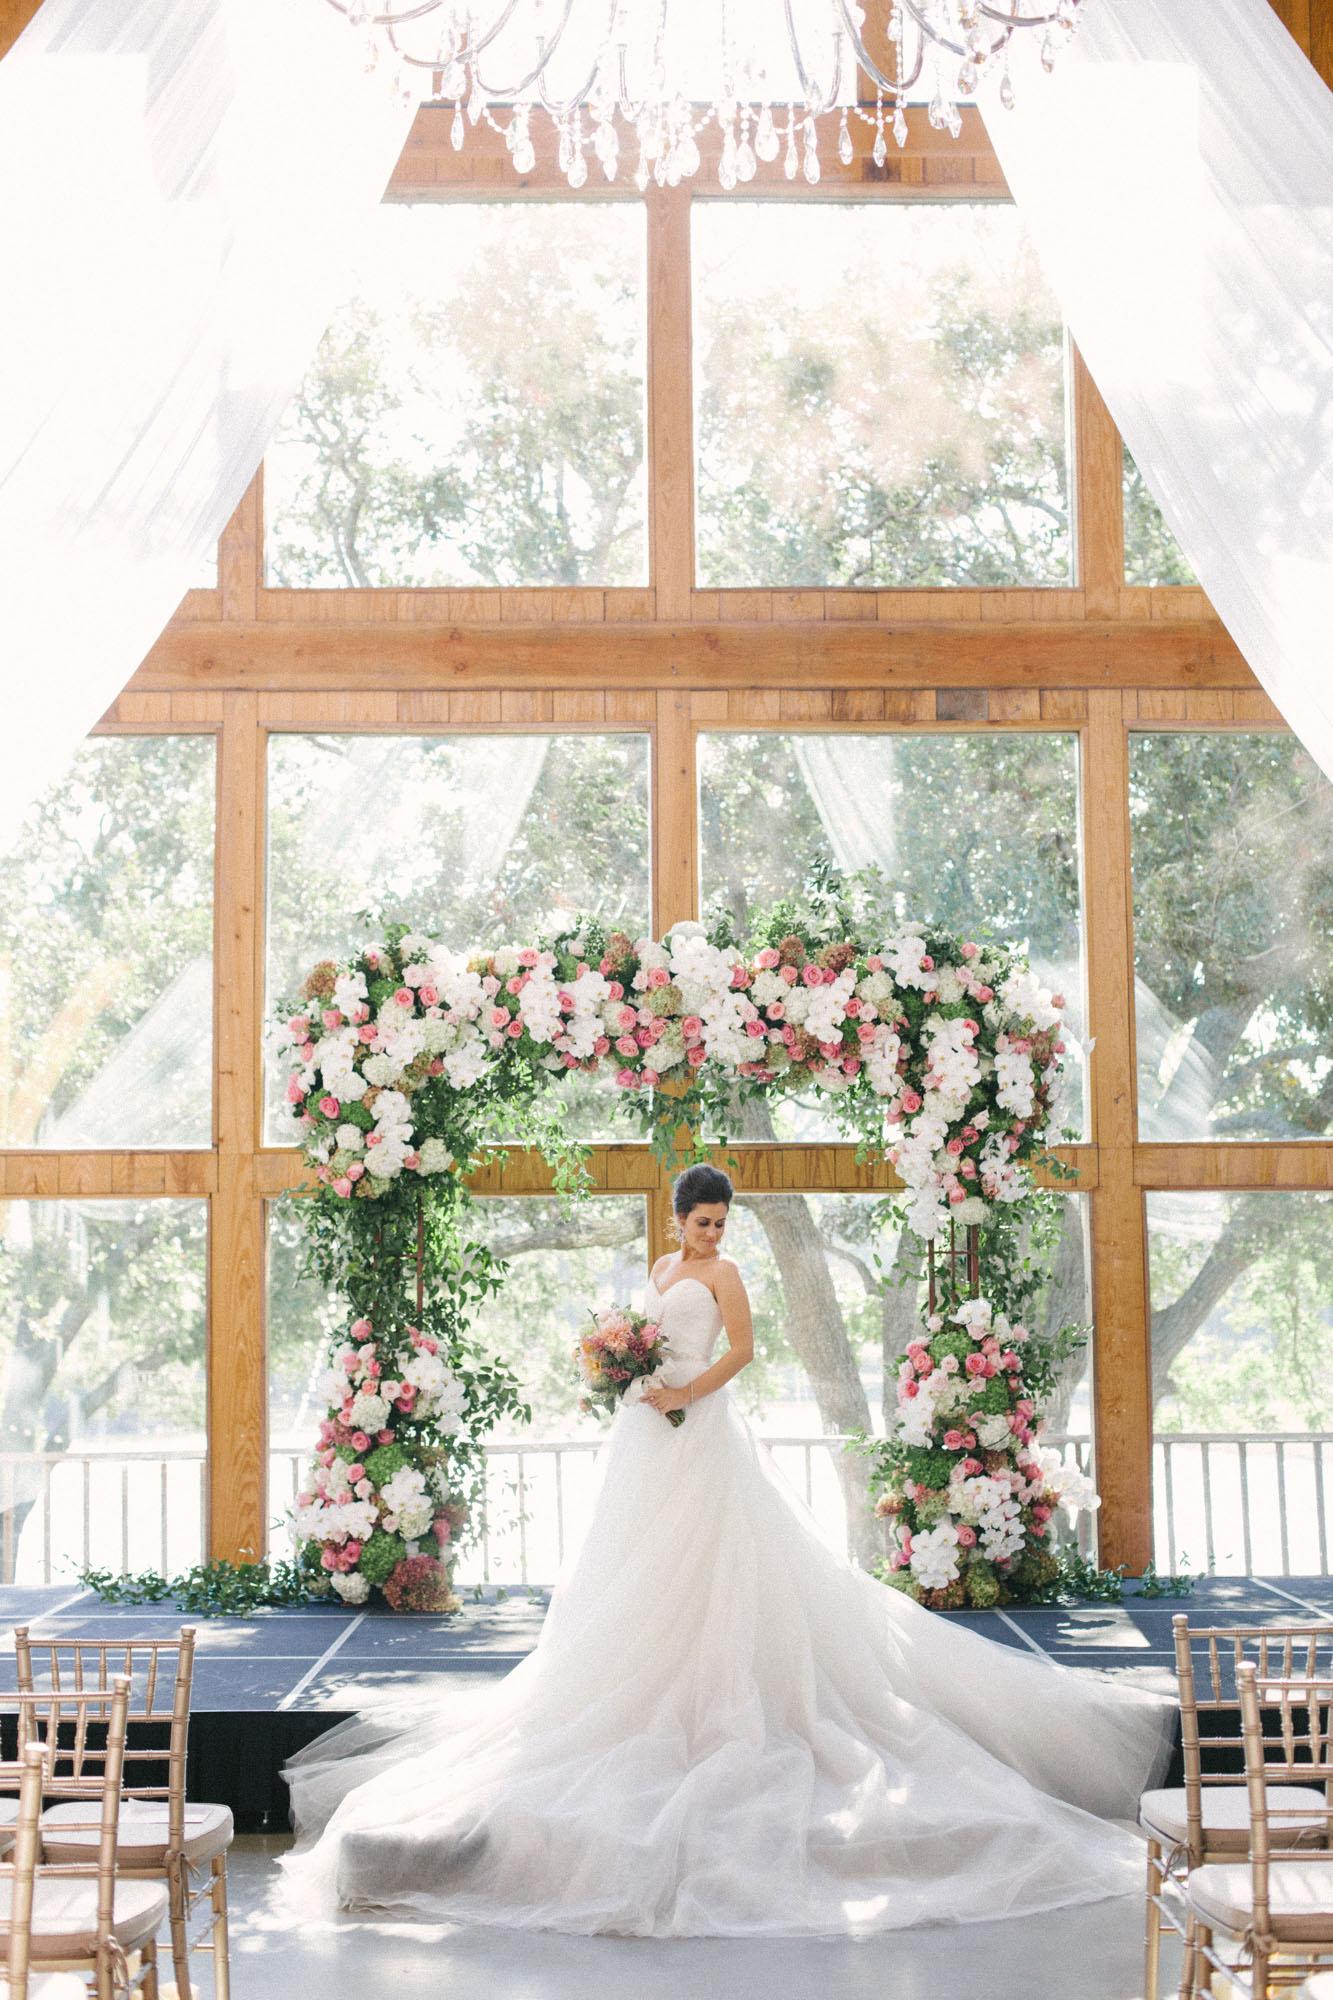 SM anna smith photography wedding photographer venue wedding planner-347.jpg